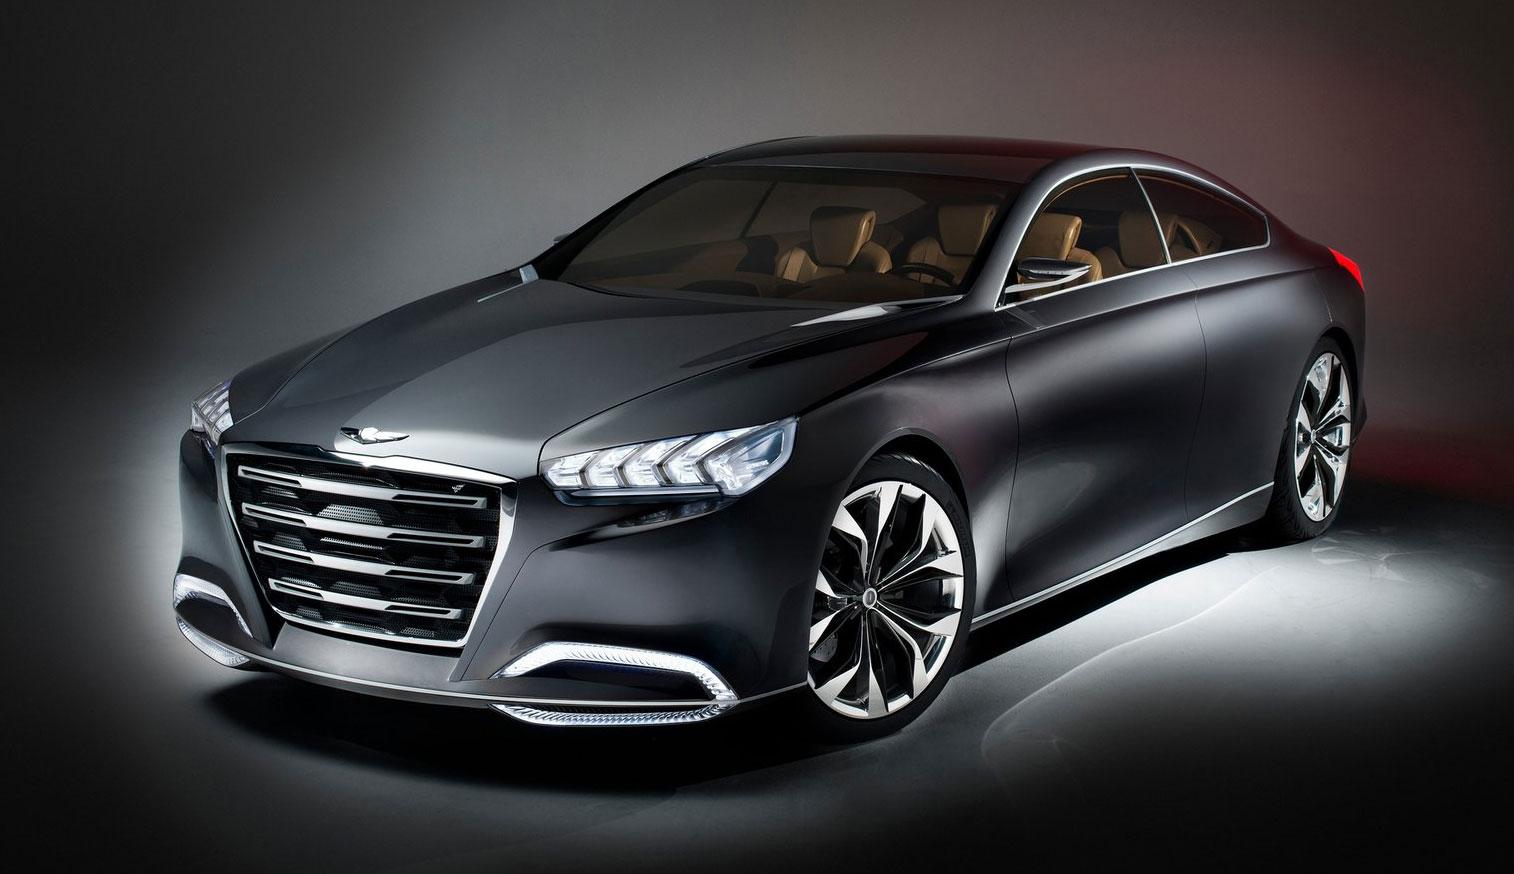 Hyundai Hcd 14 Genesis Concept Rwd 4 Door Coupe Paul Tan